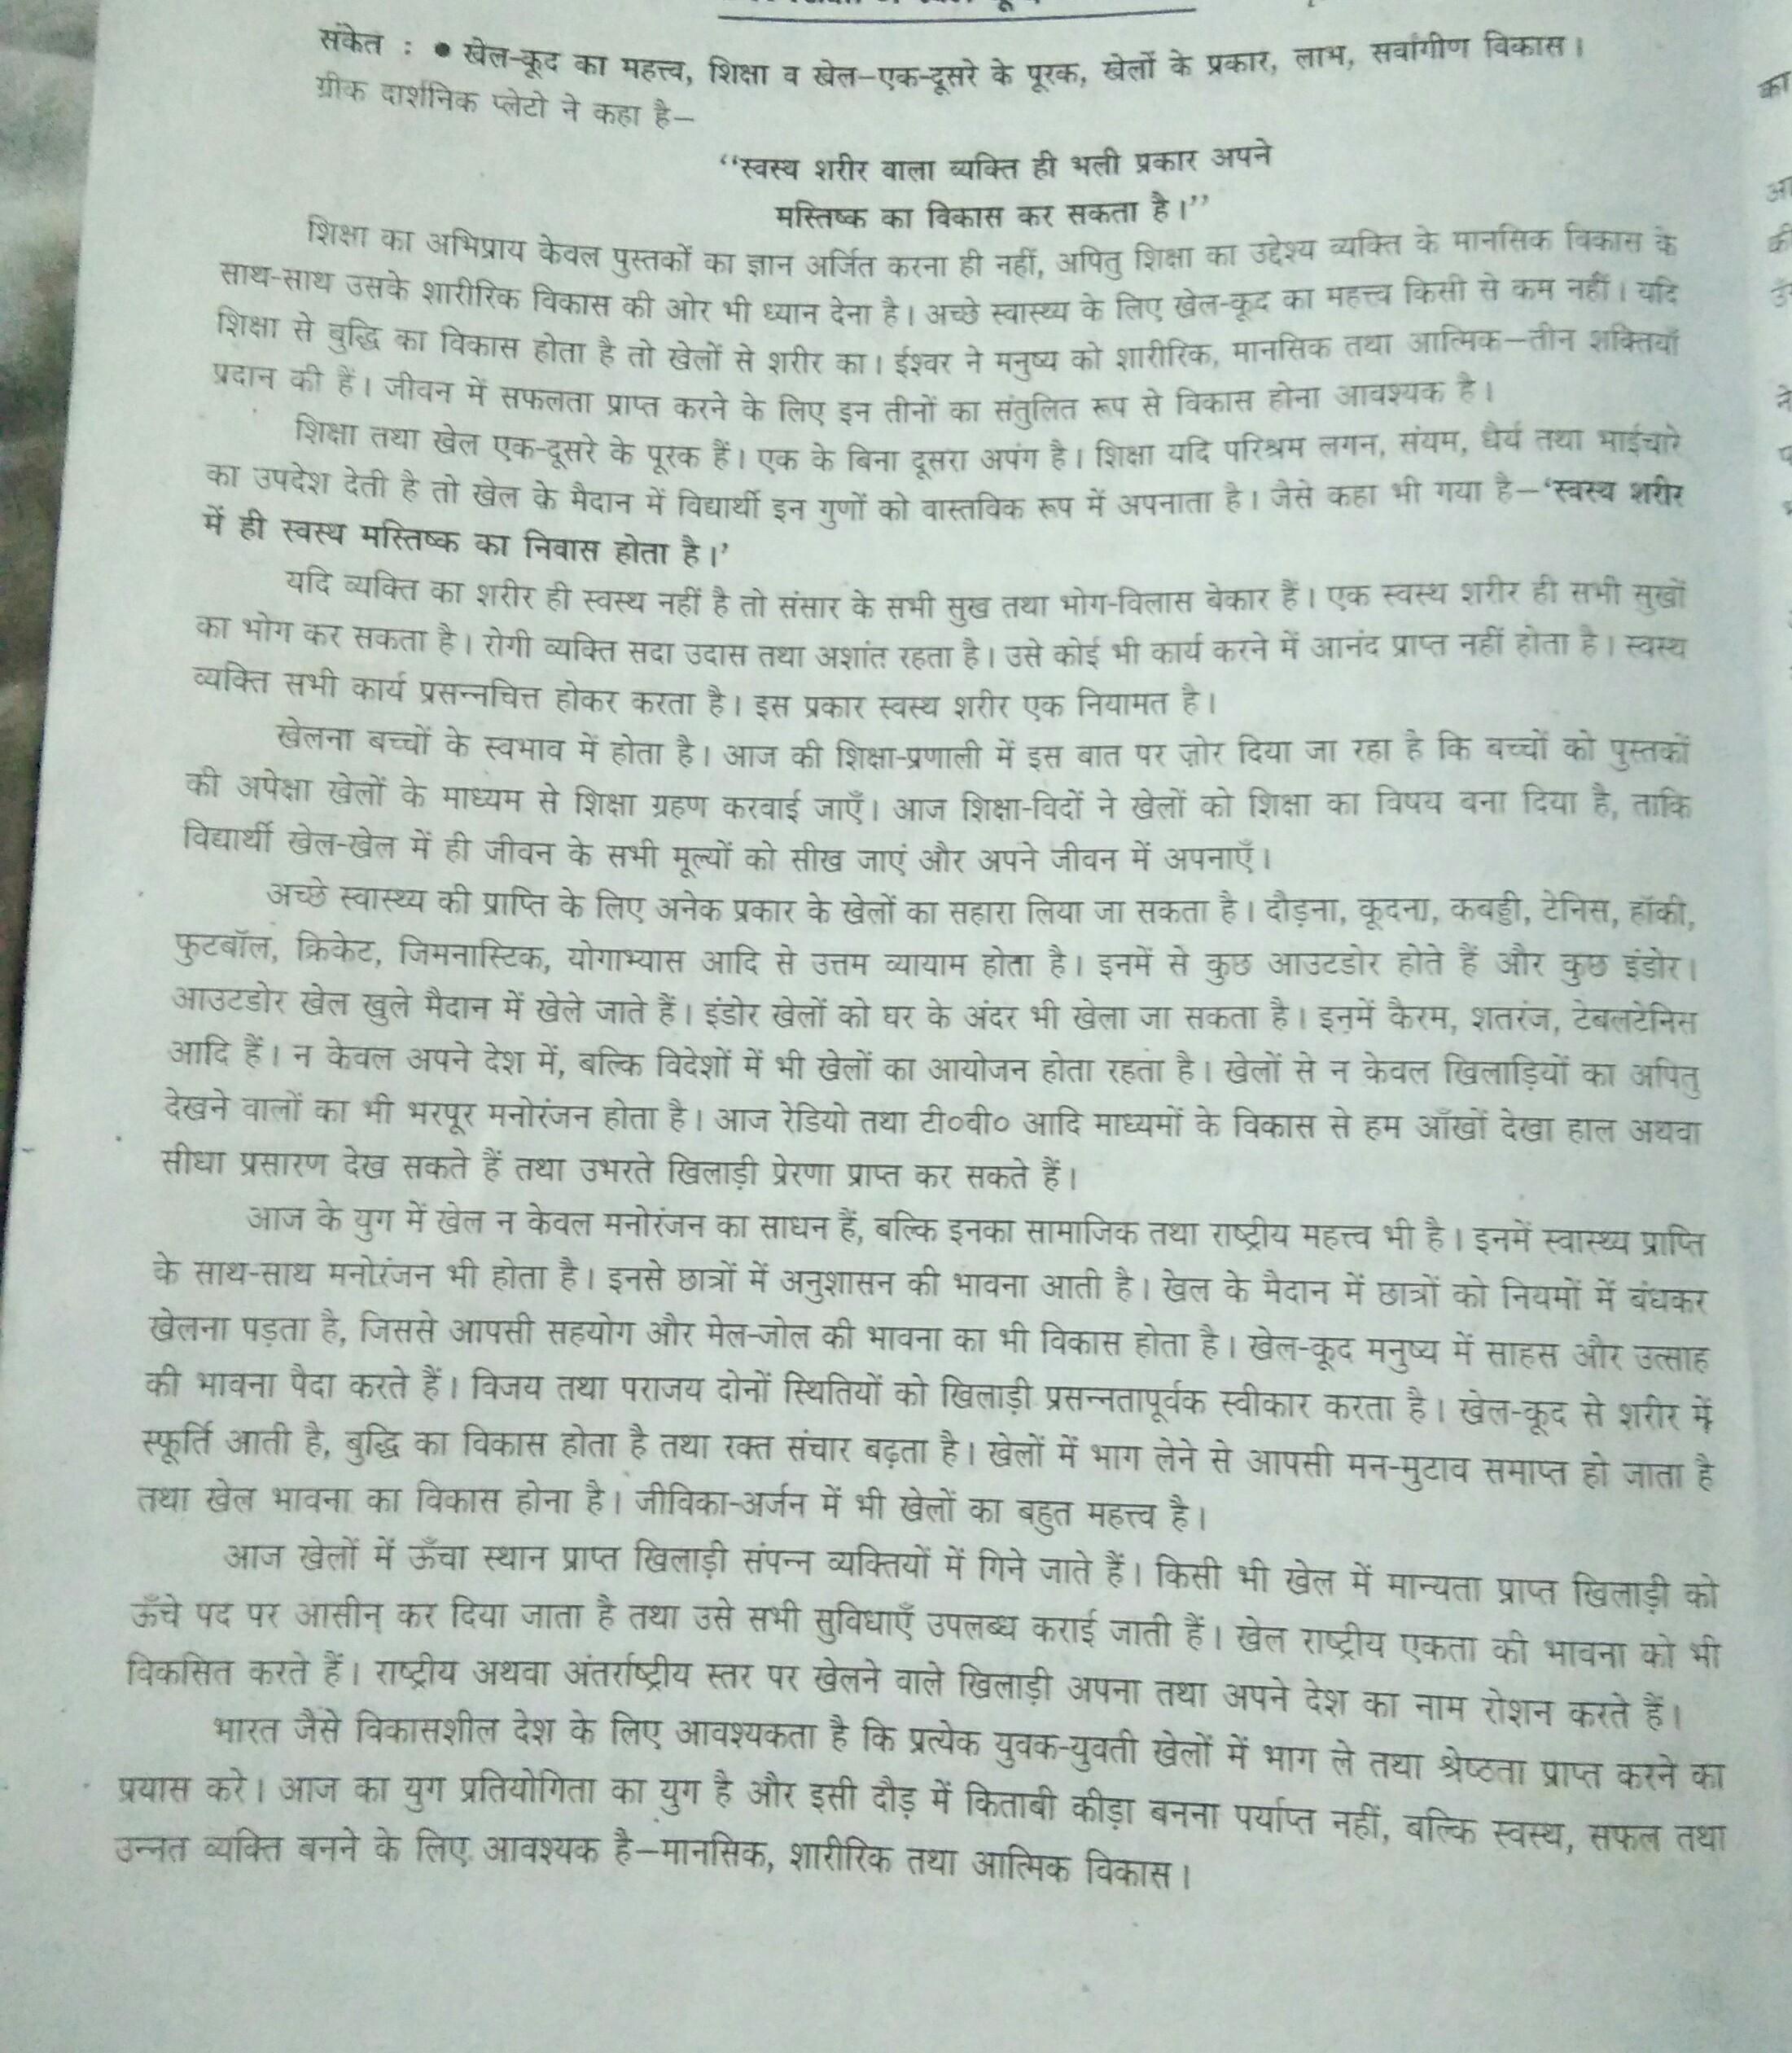 essay on vidyarthi jeevan me khelo ka mahatva